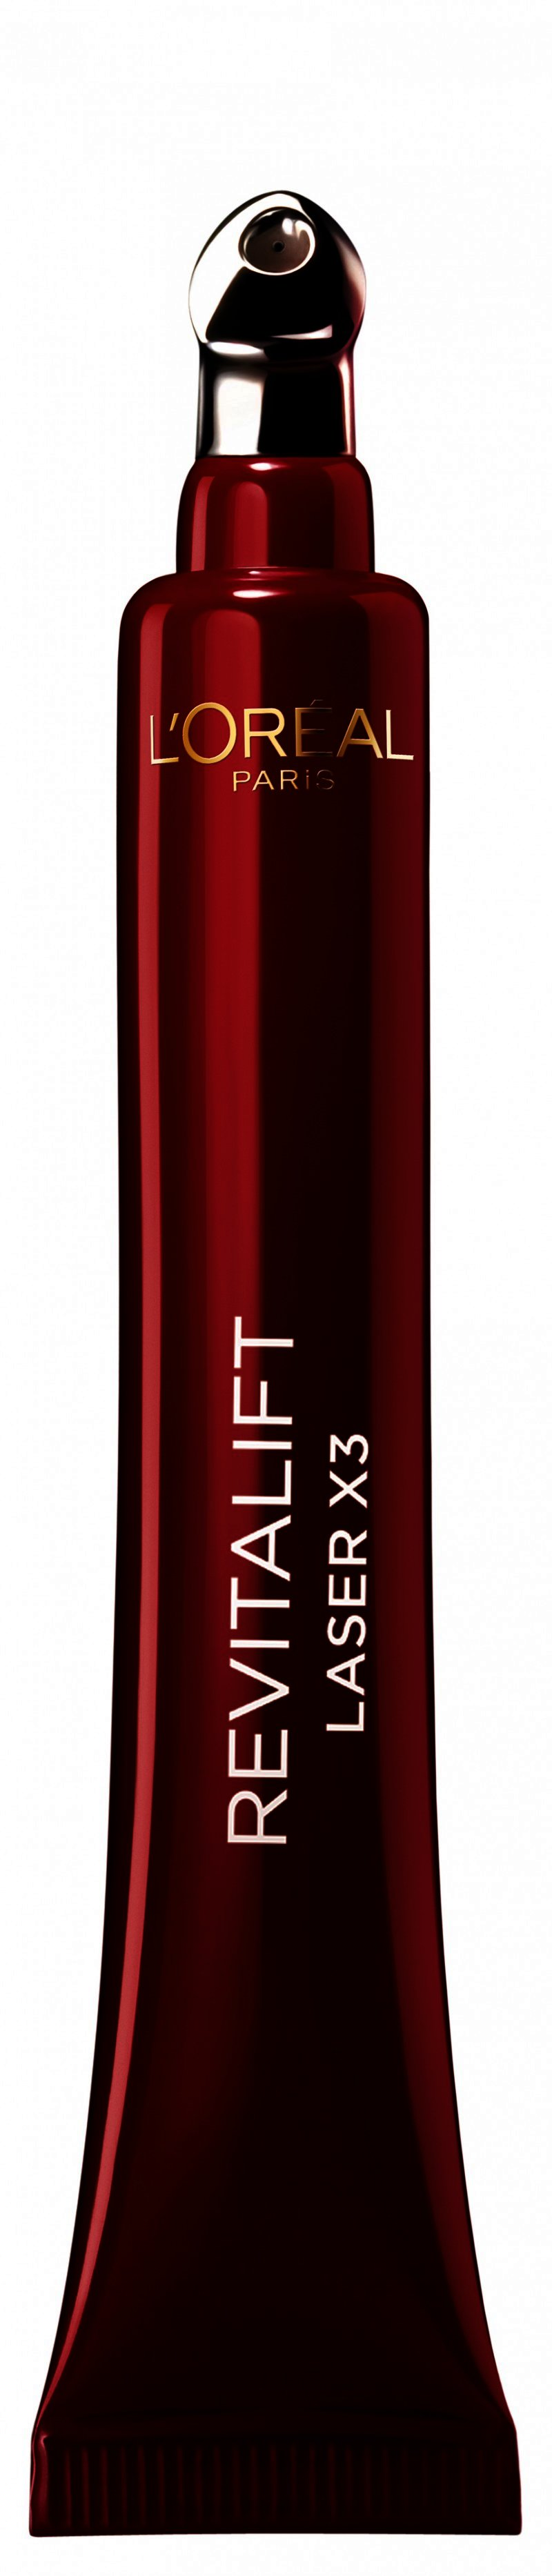 , Crema Antirid Pentru Ochi L'oreal Paris Revitalift Laser X3 15 Ml, L'Oréal Paris